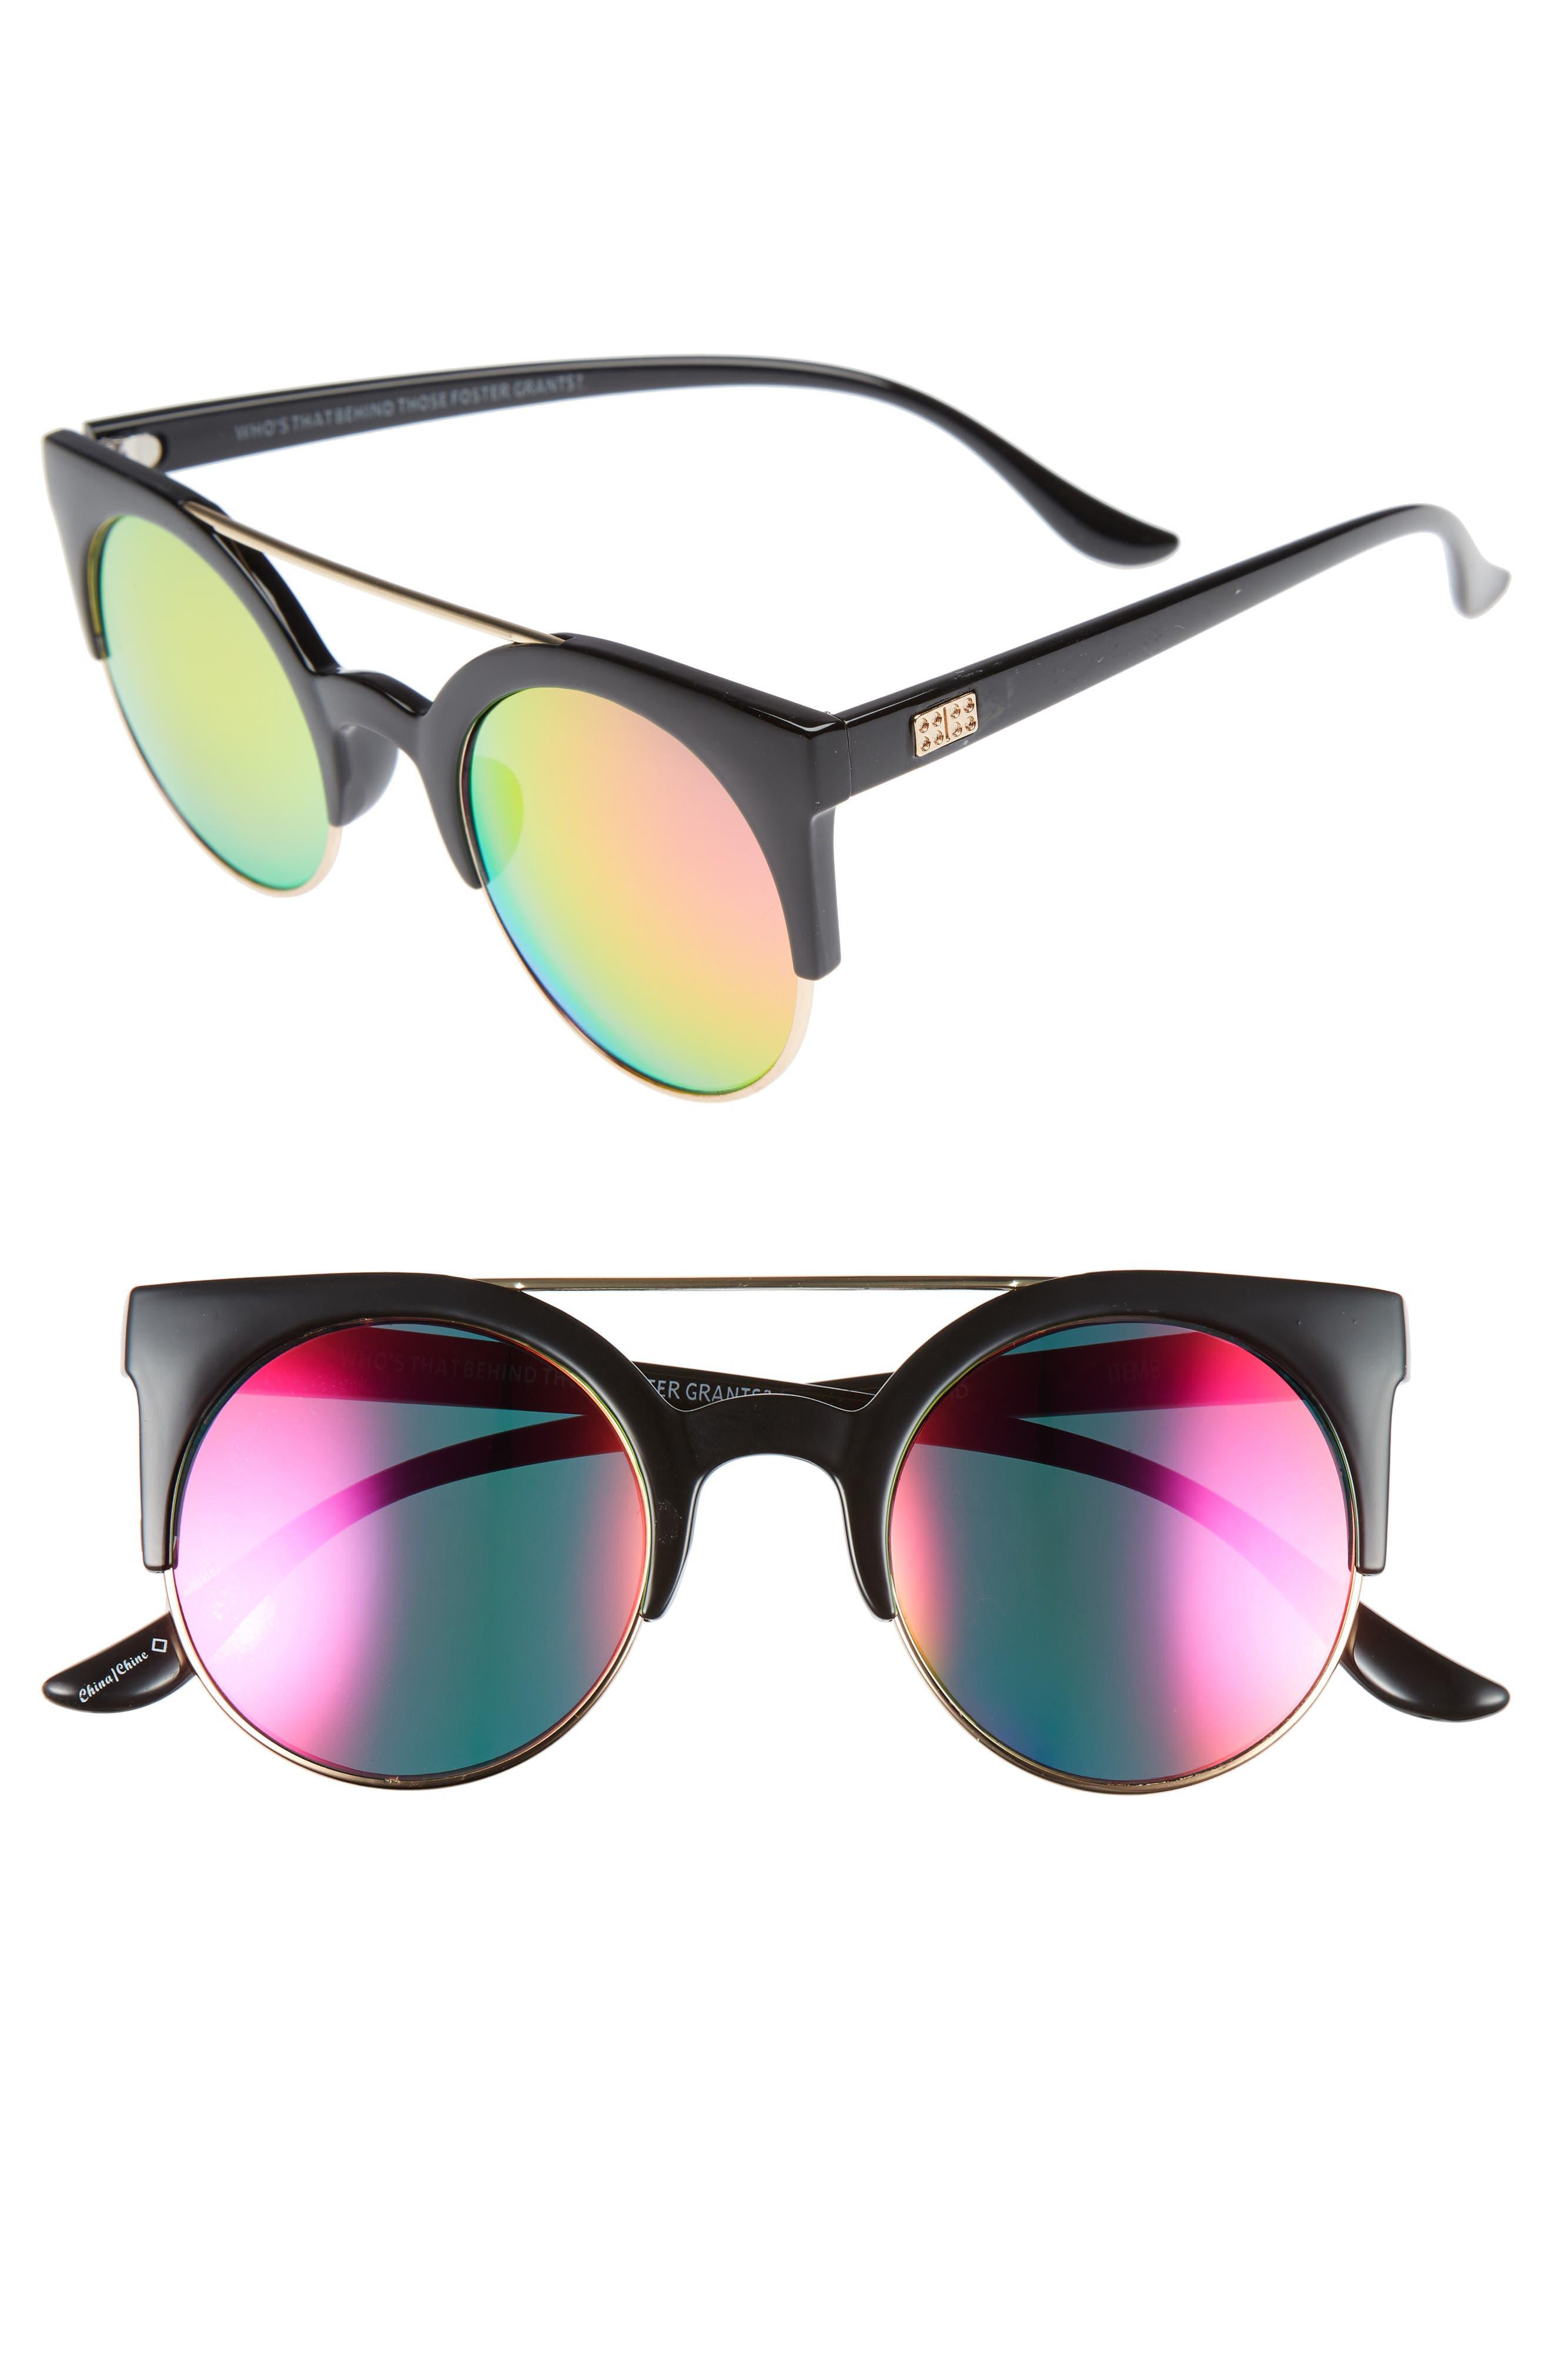 ITEM 8 MG.2 50mm Sunglasses